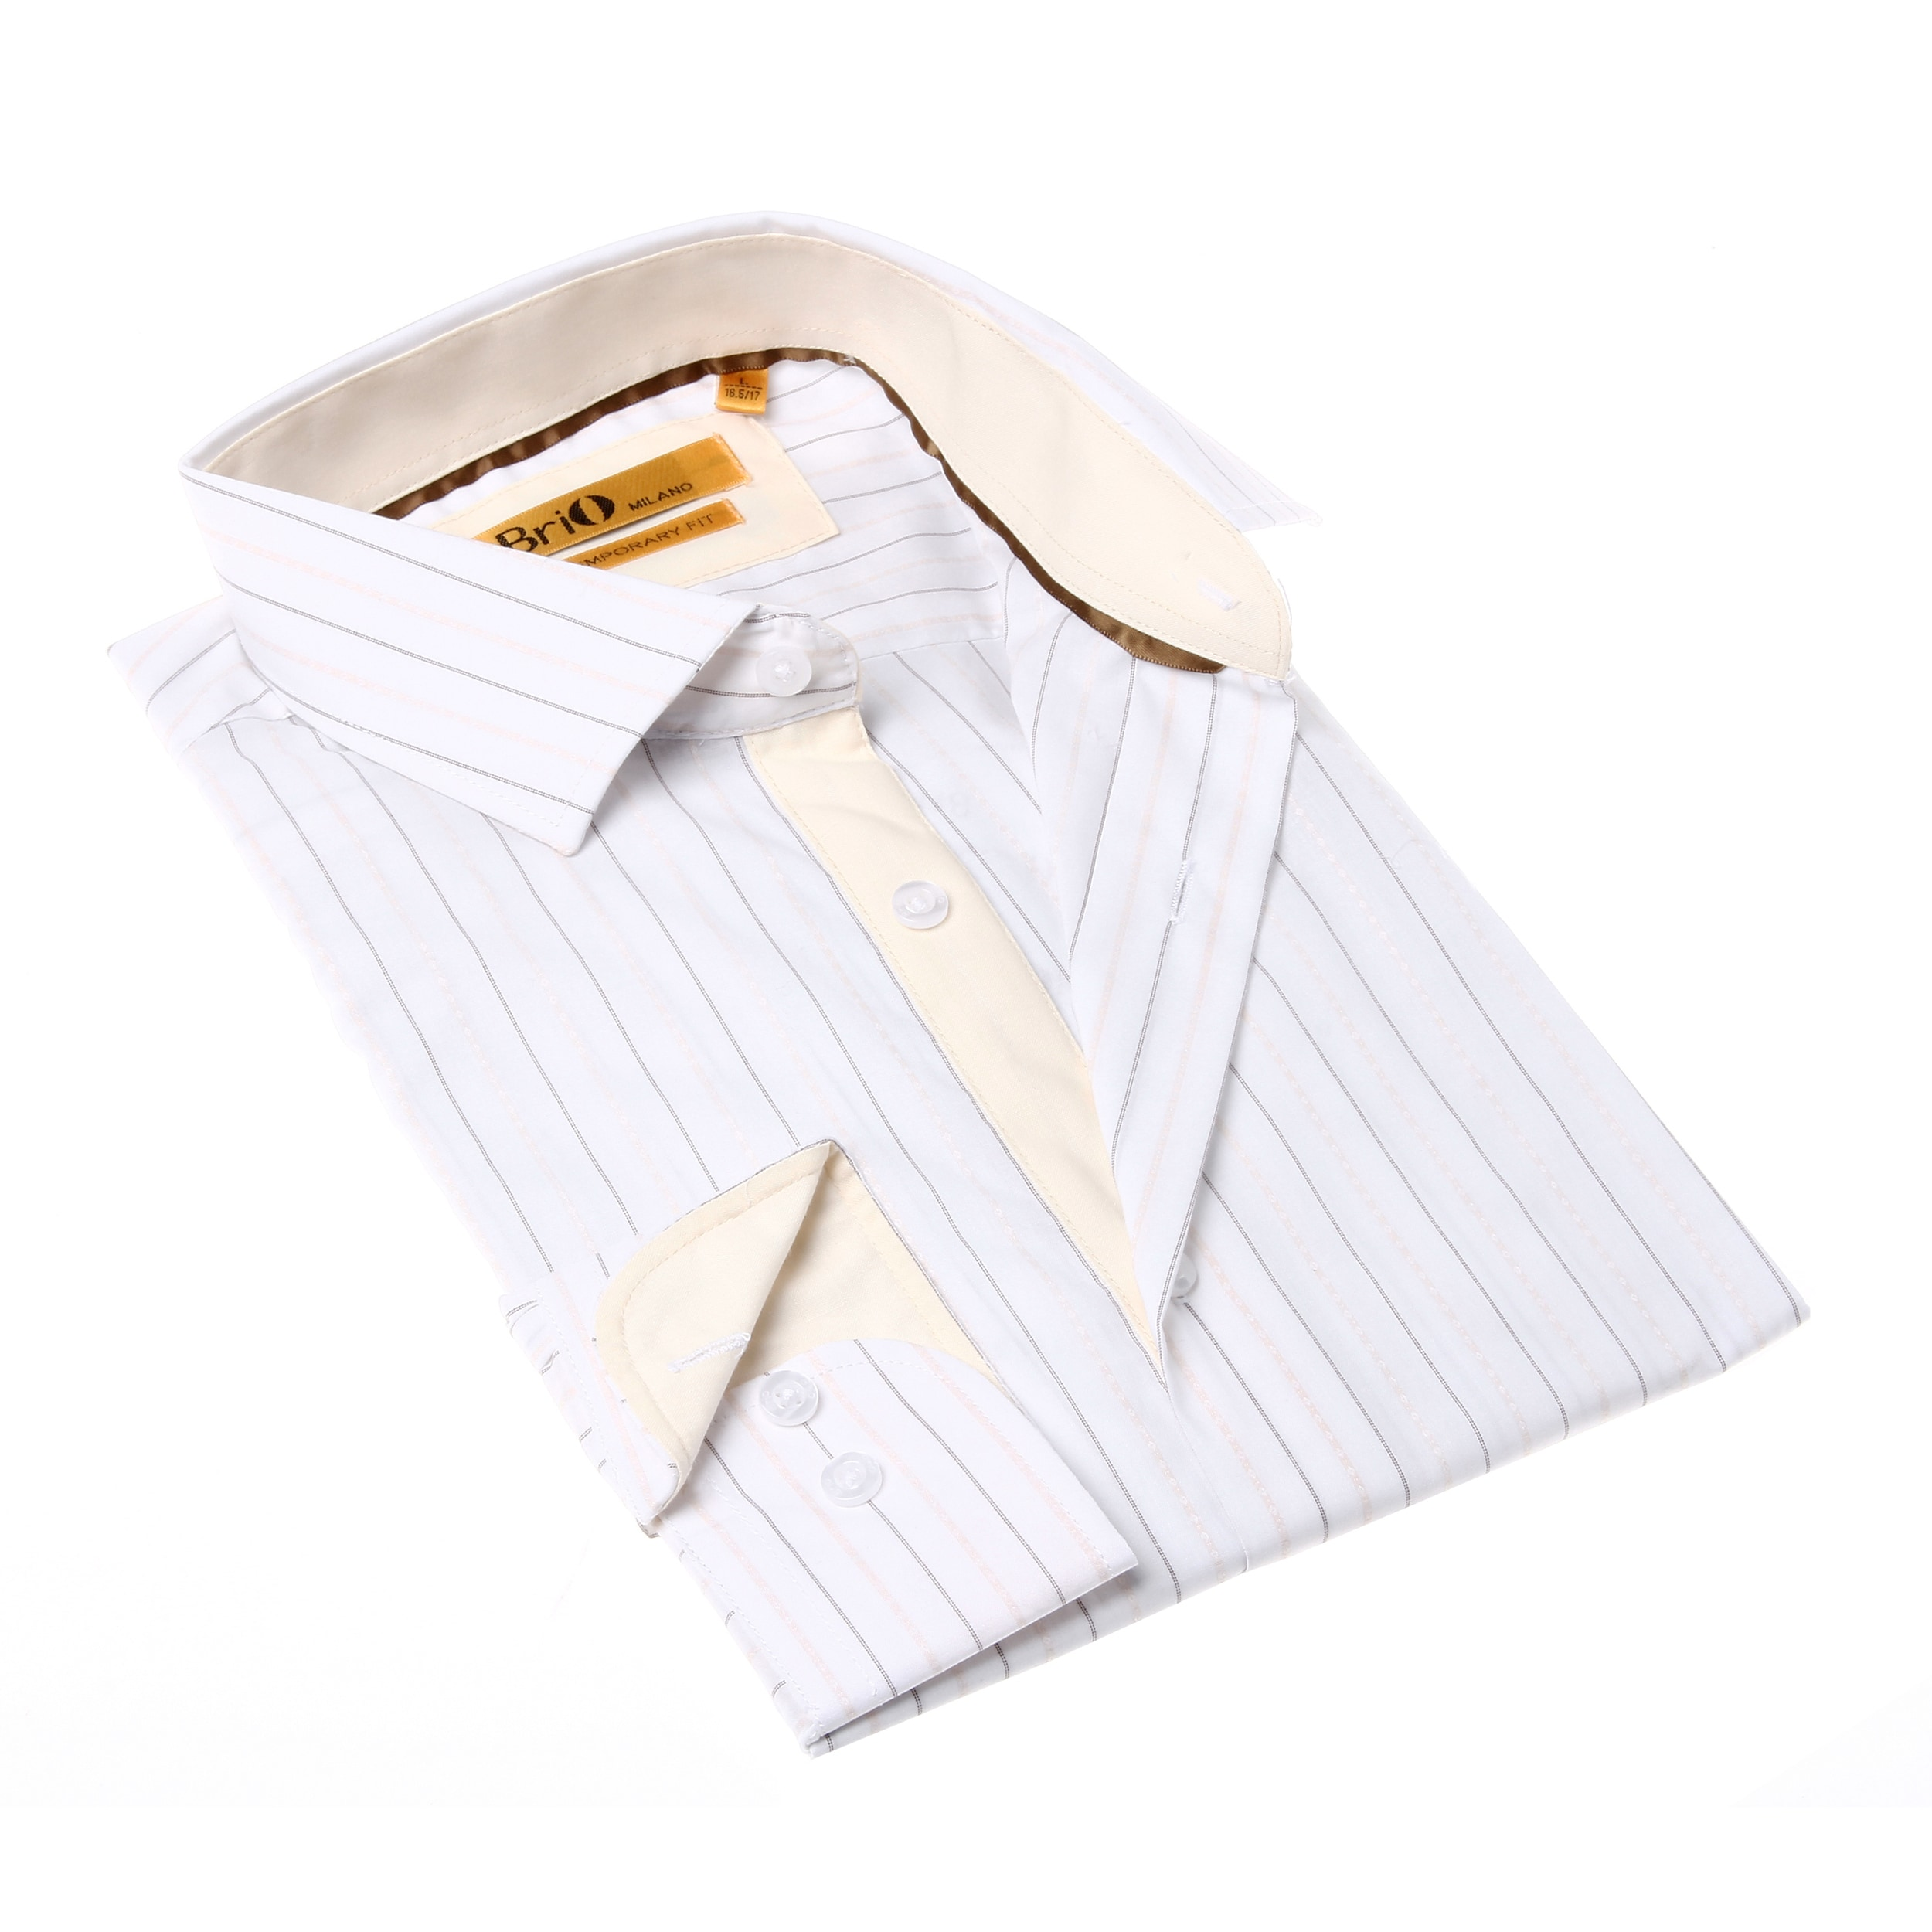 Shop Brio Milano Mens White And Yellow Stripe Button Up Dress Shirt